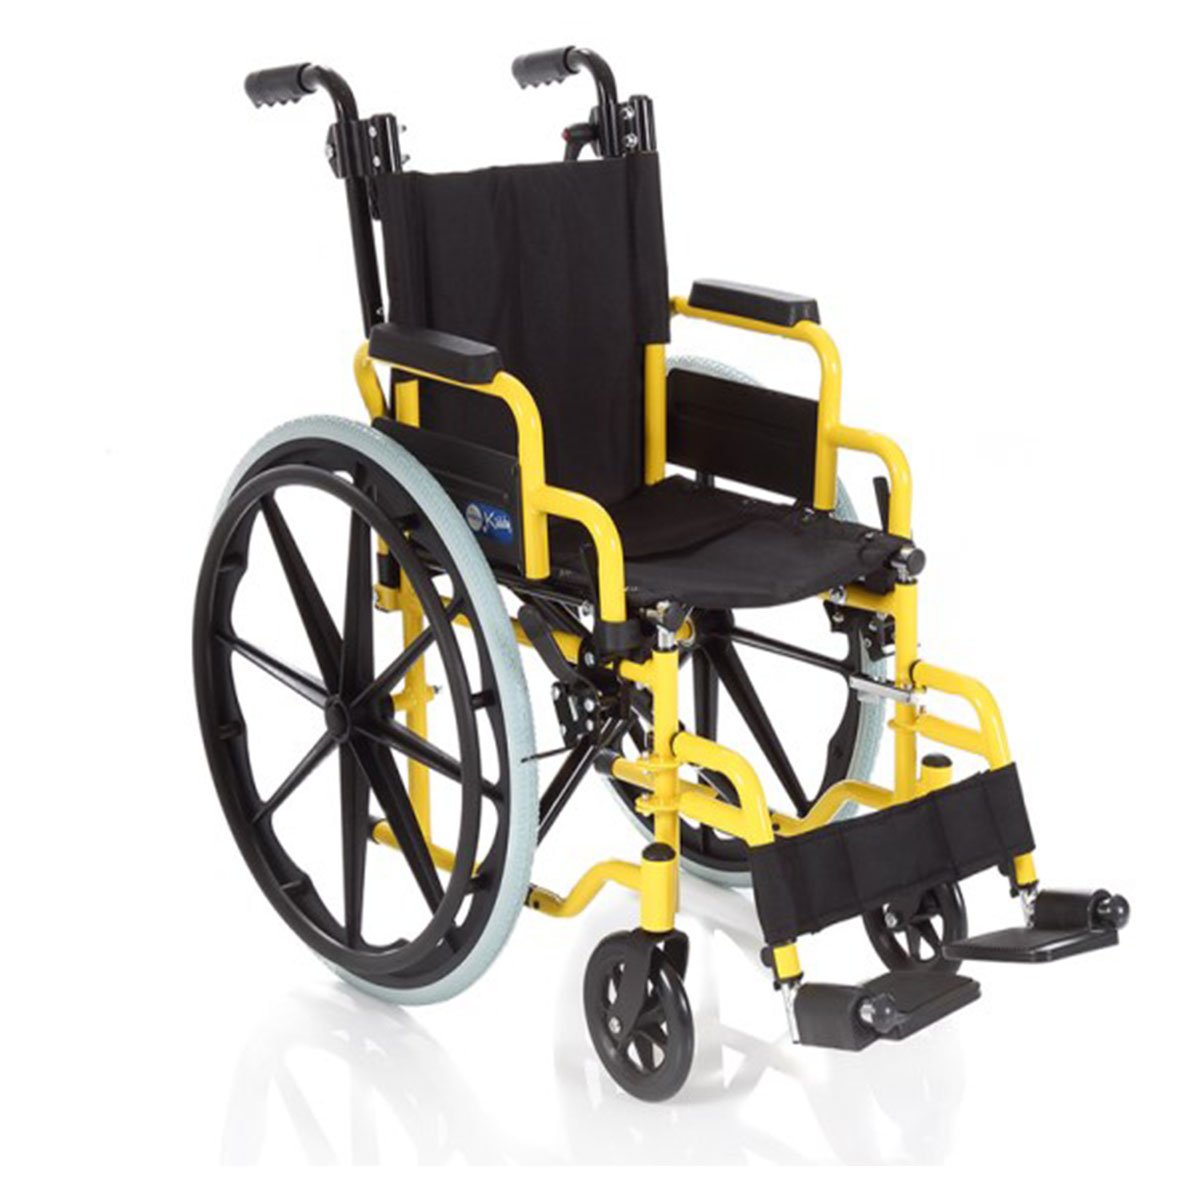 Noleggio sedia a rotelle per bambini   Medinolrent